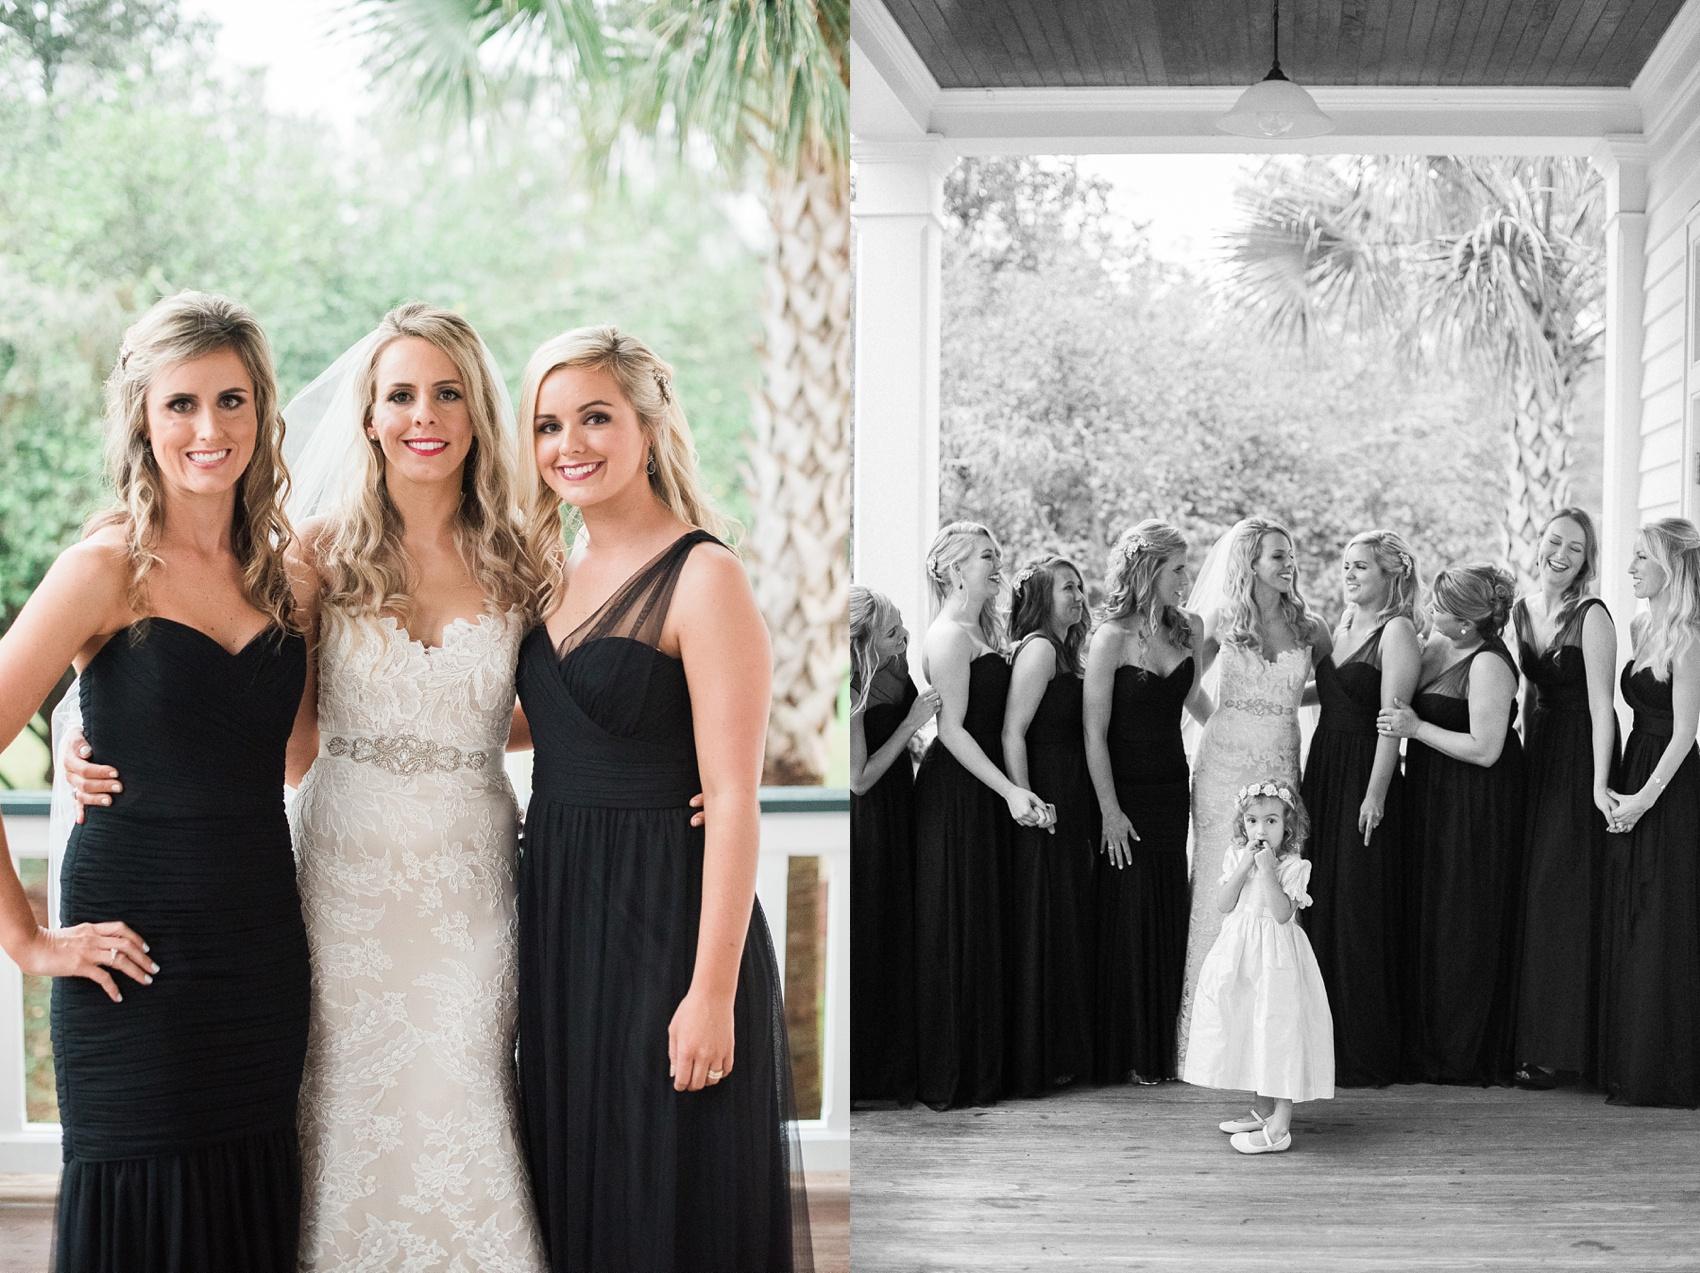 South_carolina_wedding_photographer_0063.jpg